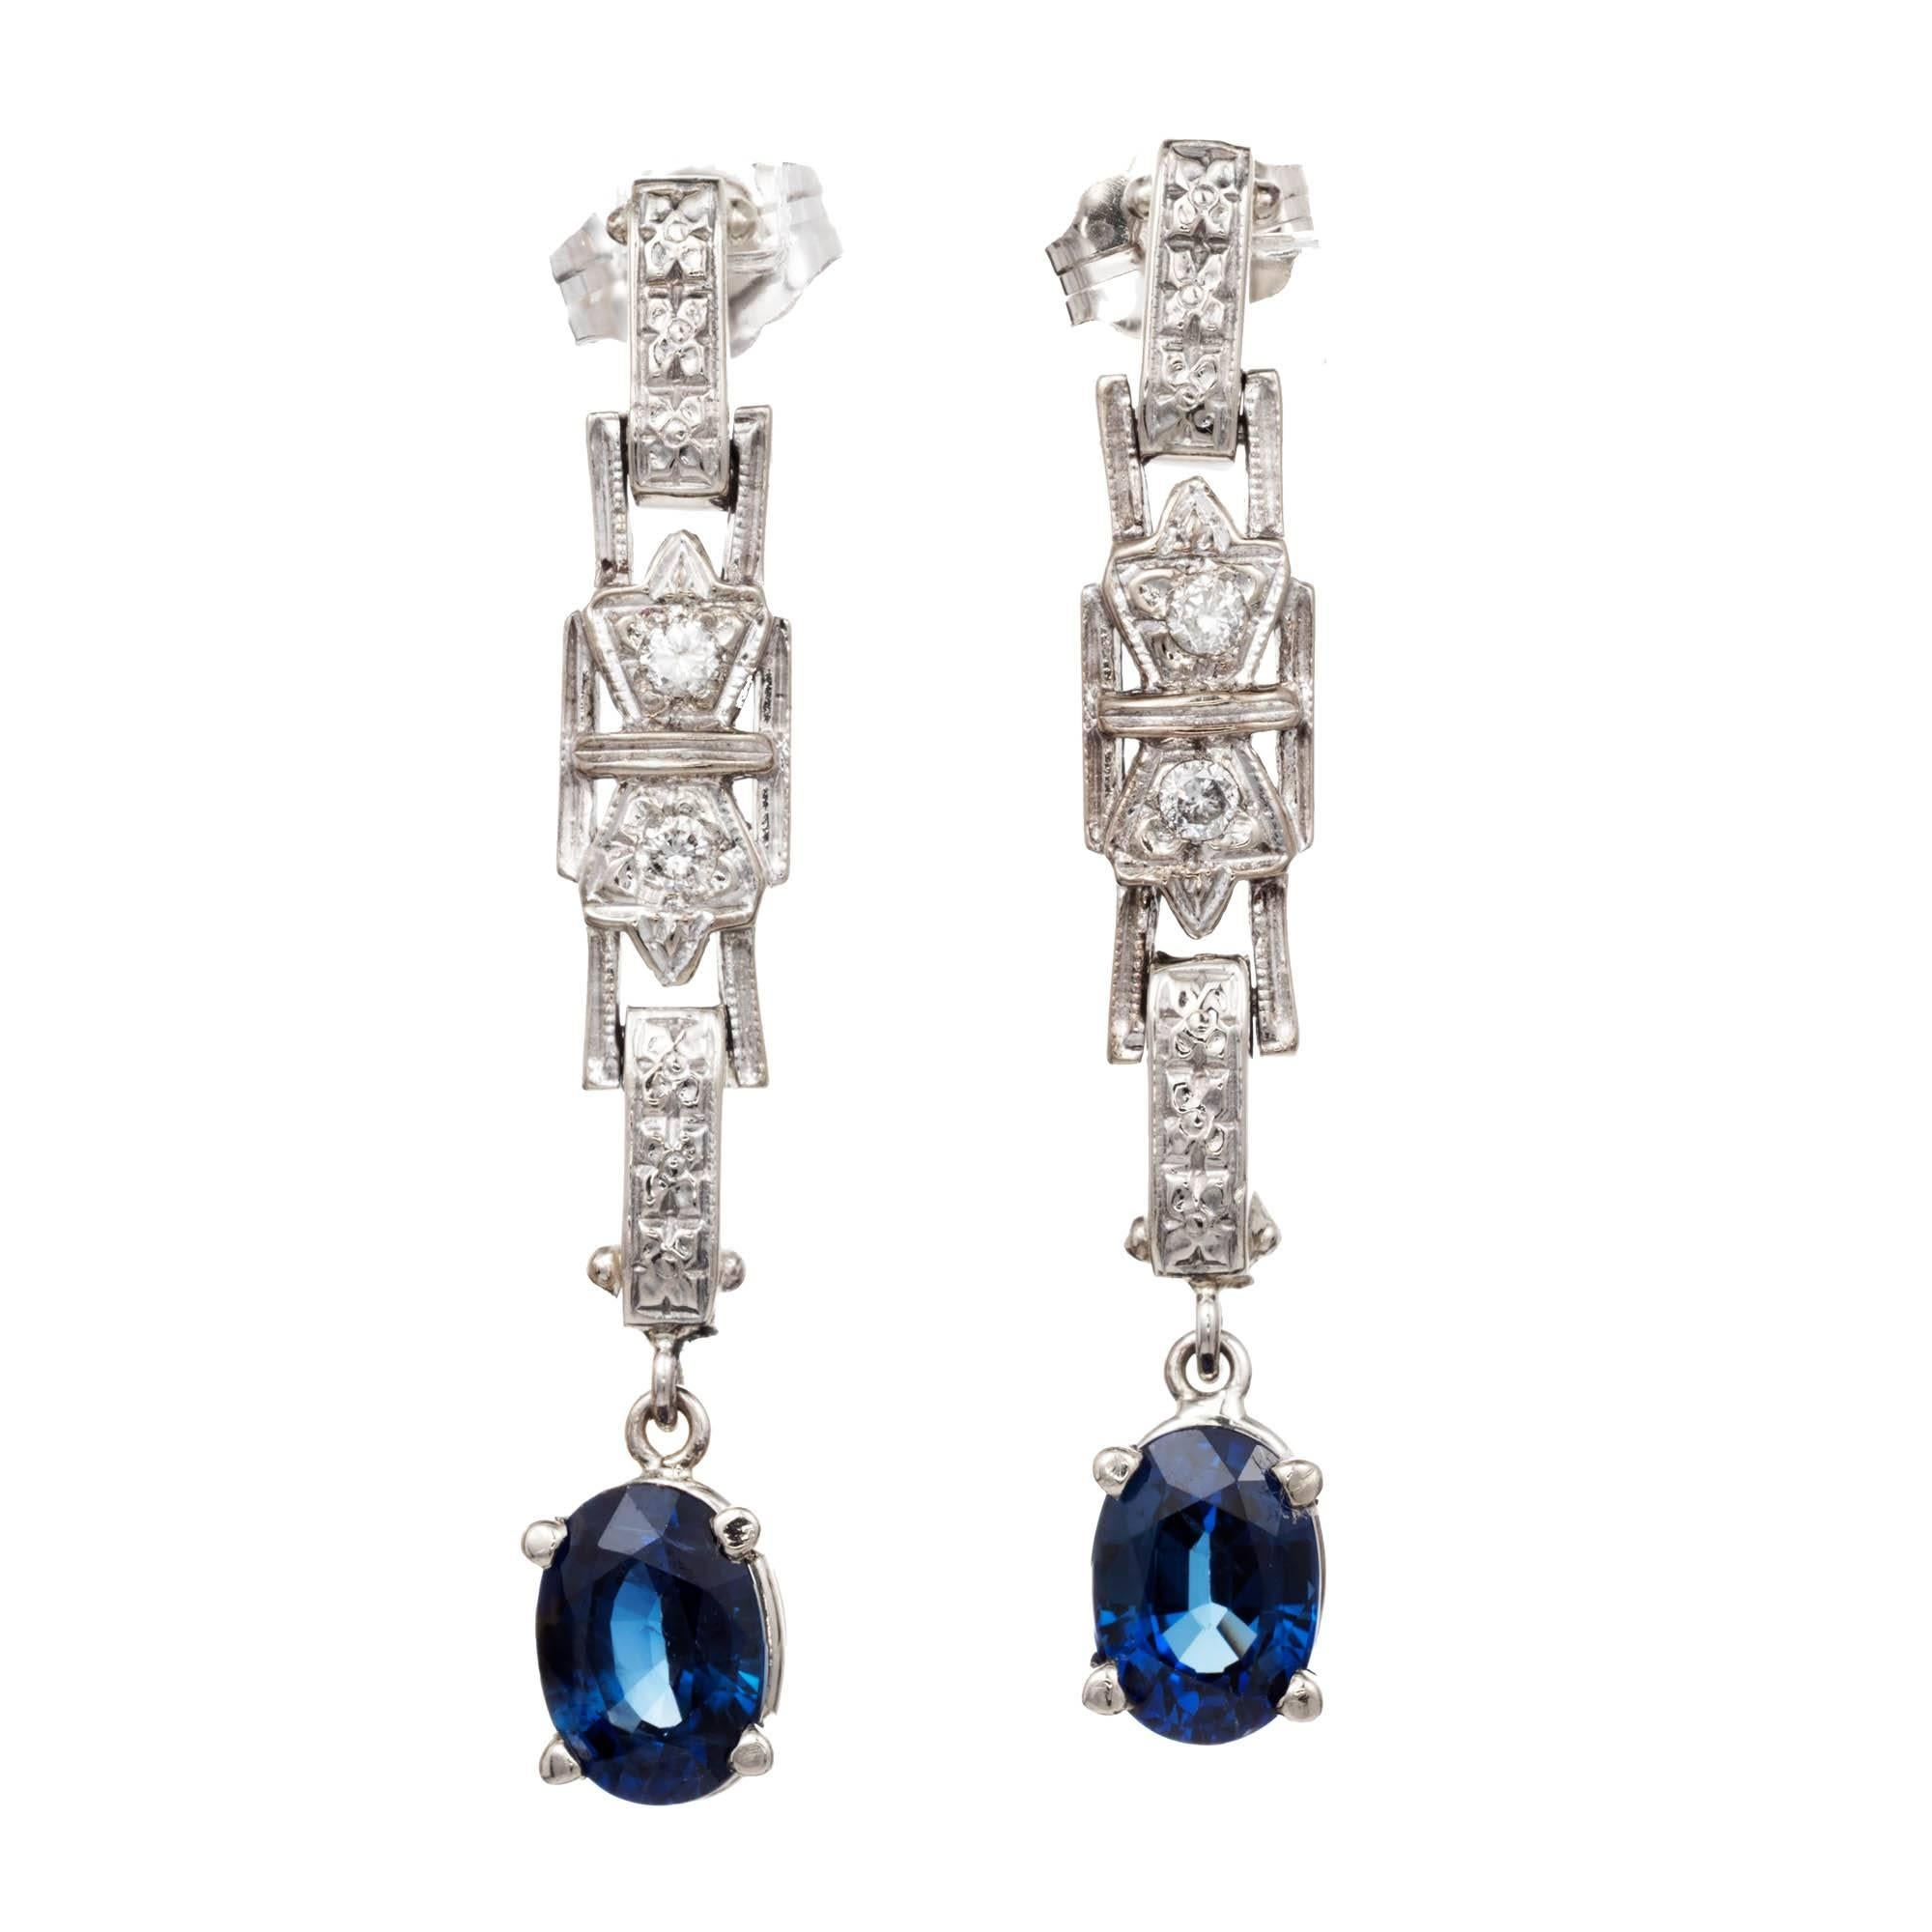 GIA Certified 2.00 Carat Oval Sapphire Diamond Gold Dangle Drop Earrings